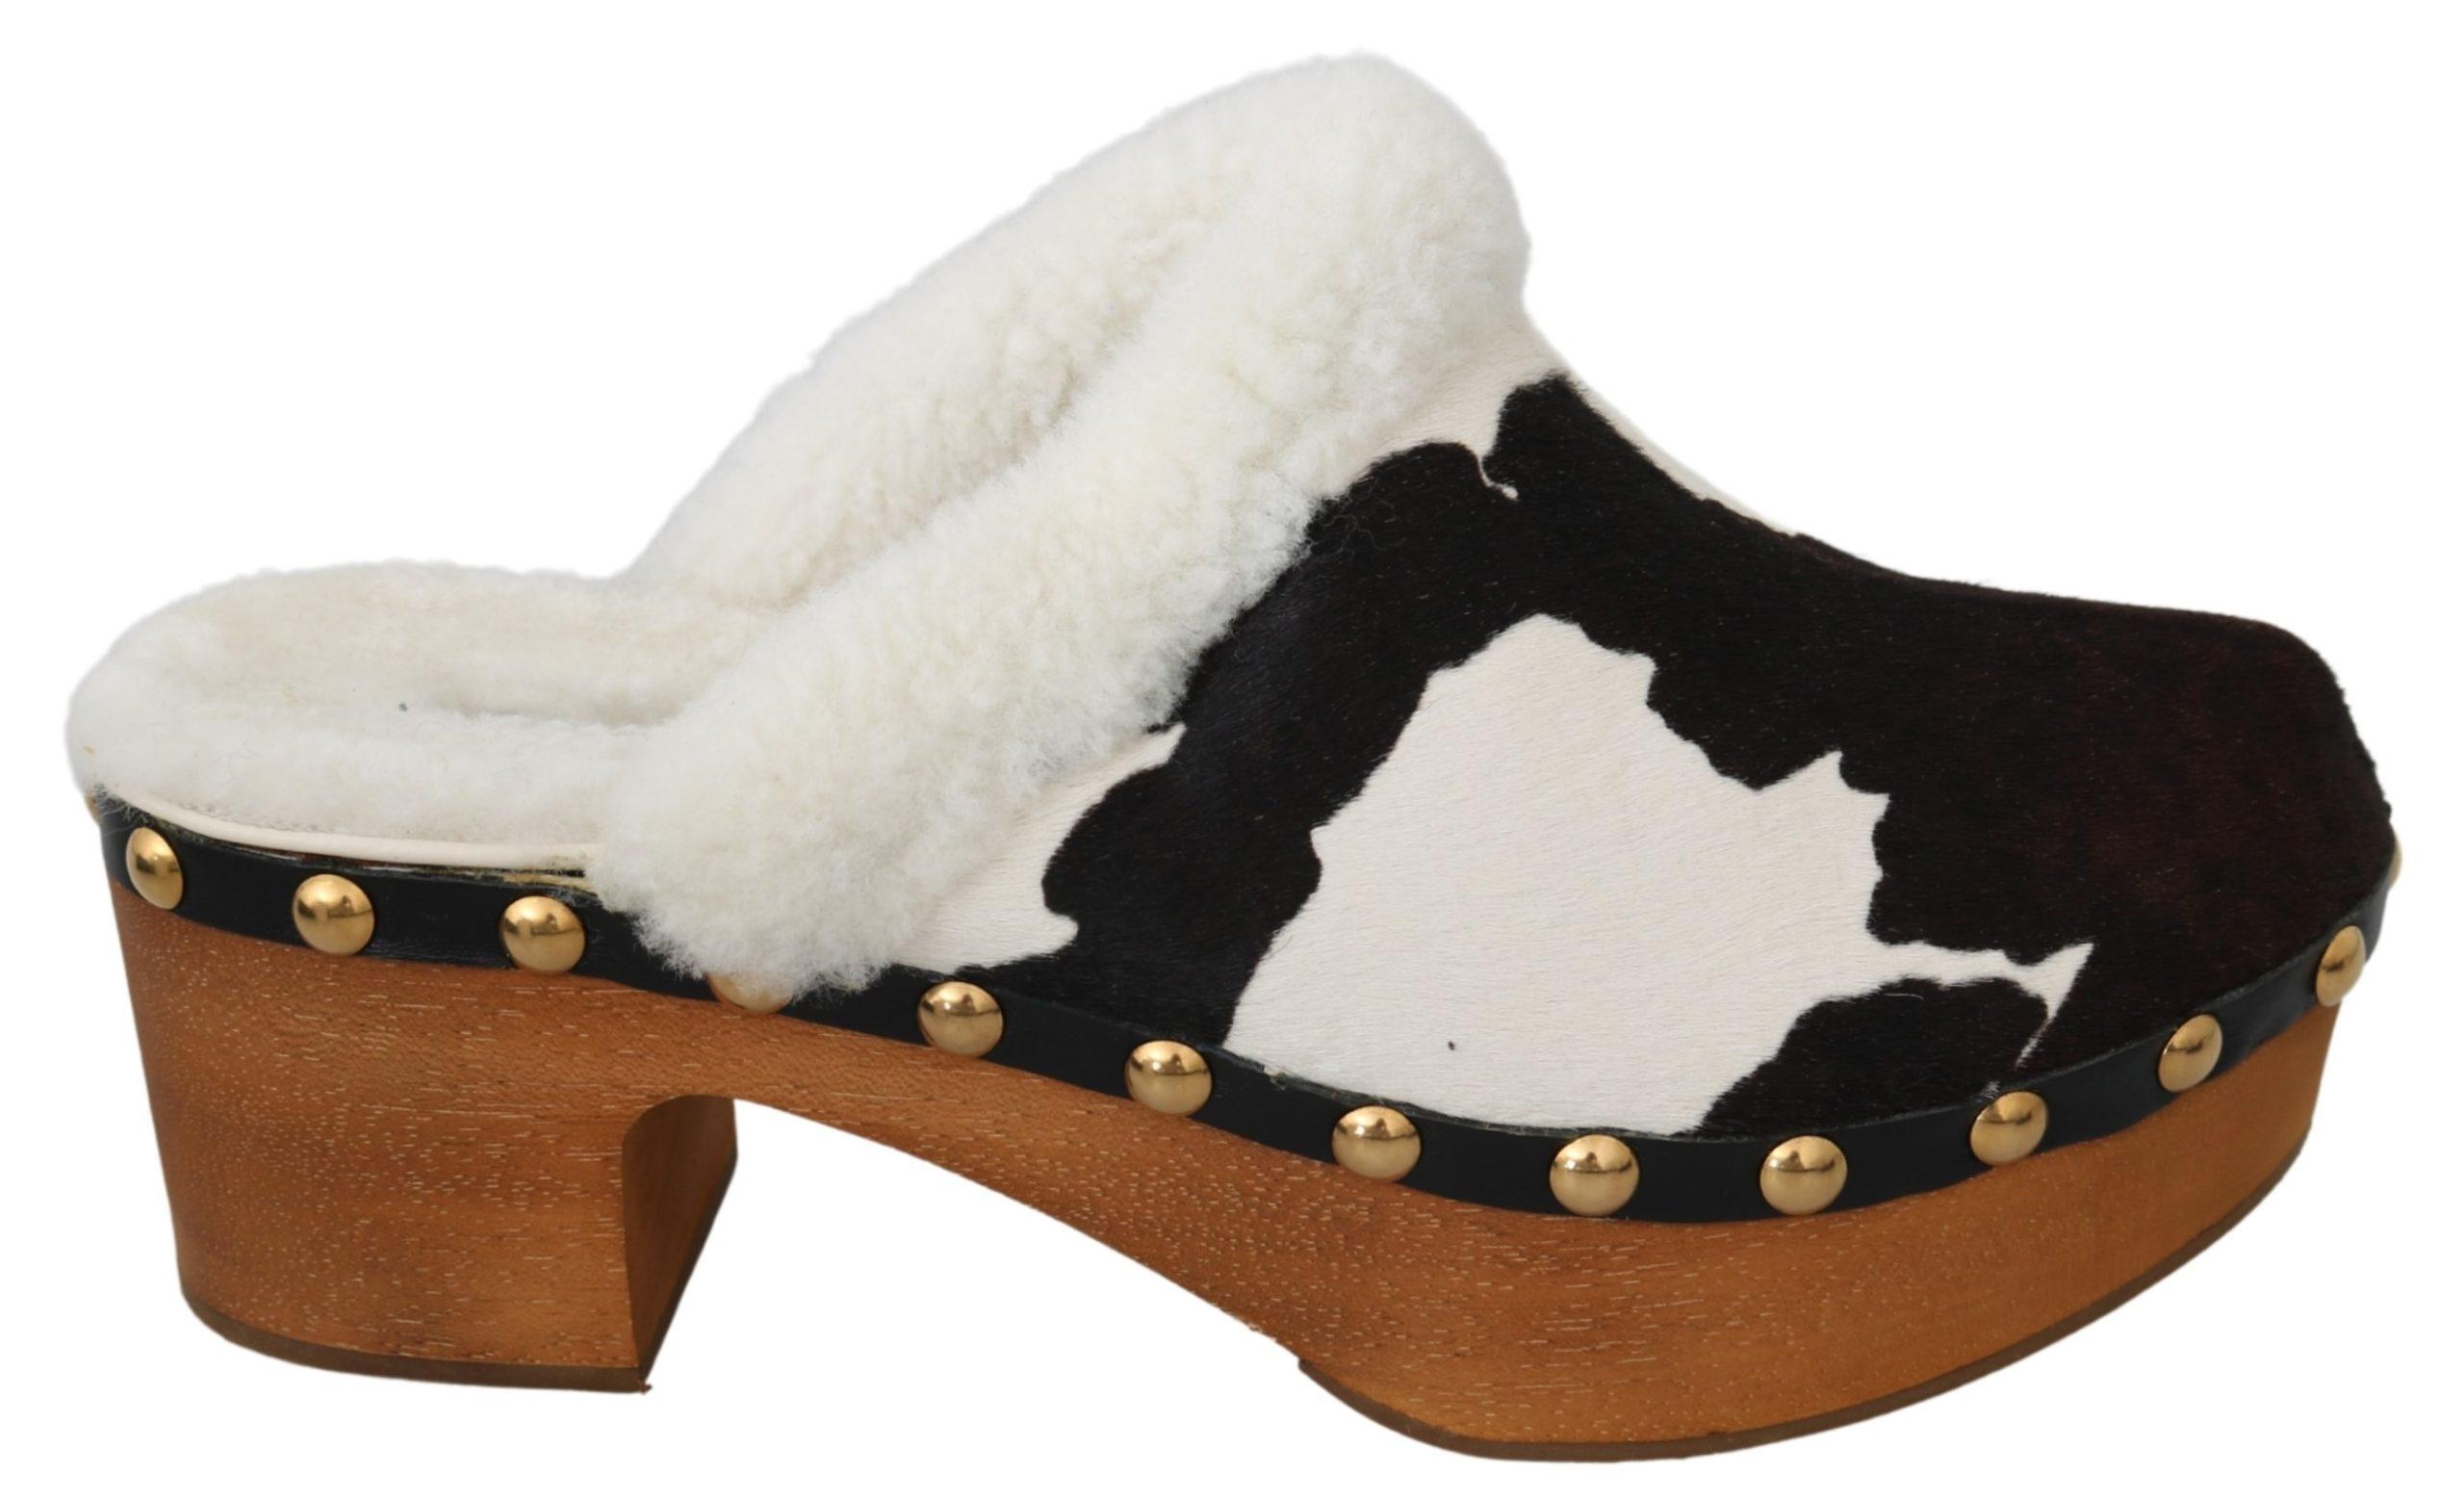 Dolce & Gabbana Women's Pony Hair Sandals Brown LA7079 - EU39/US8.5